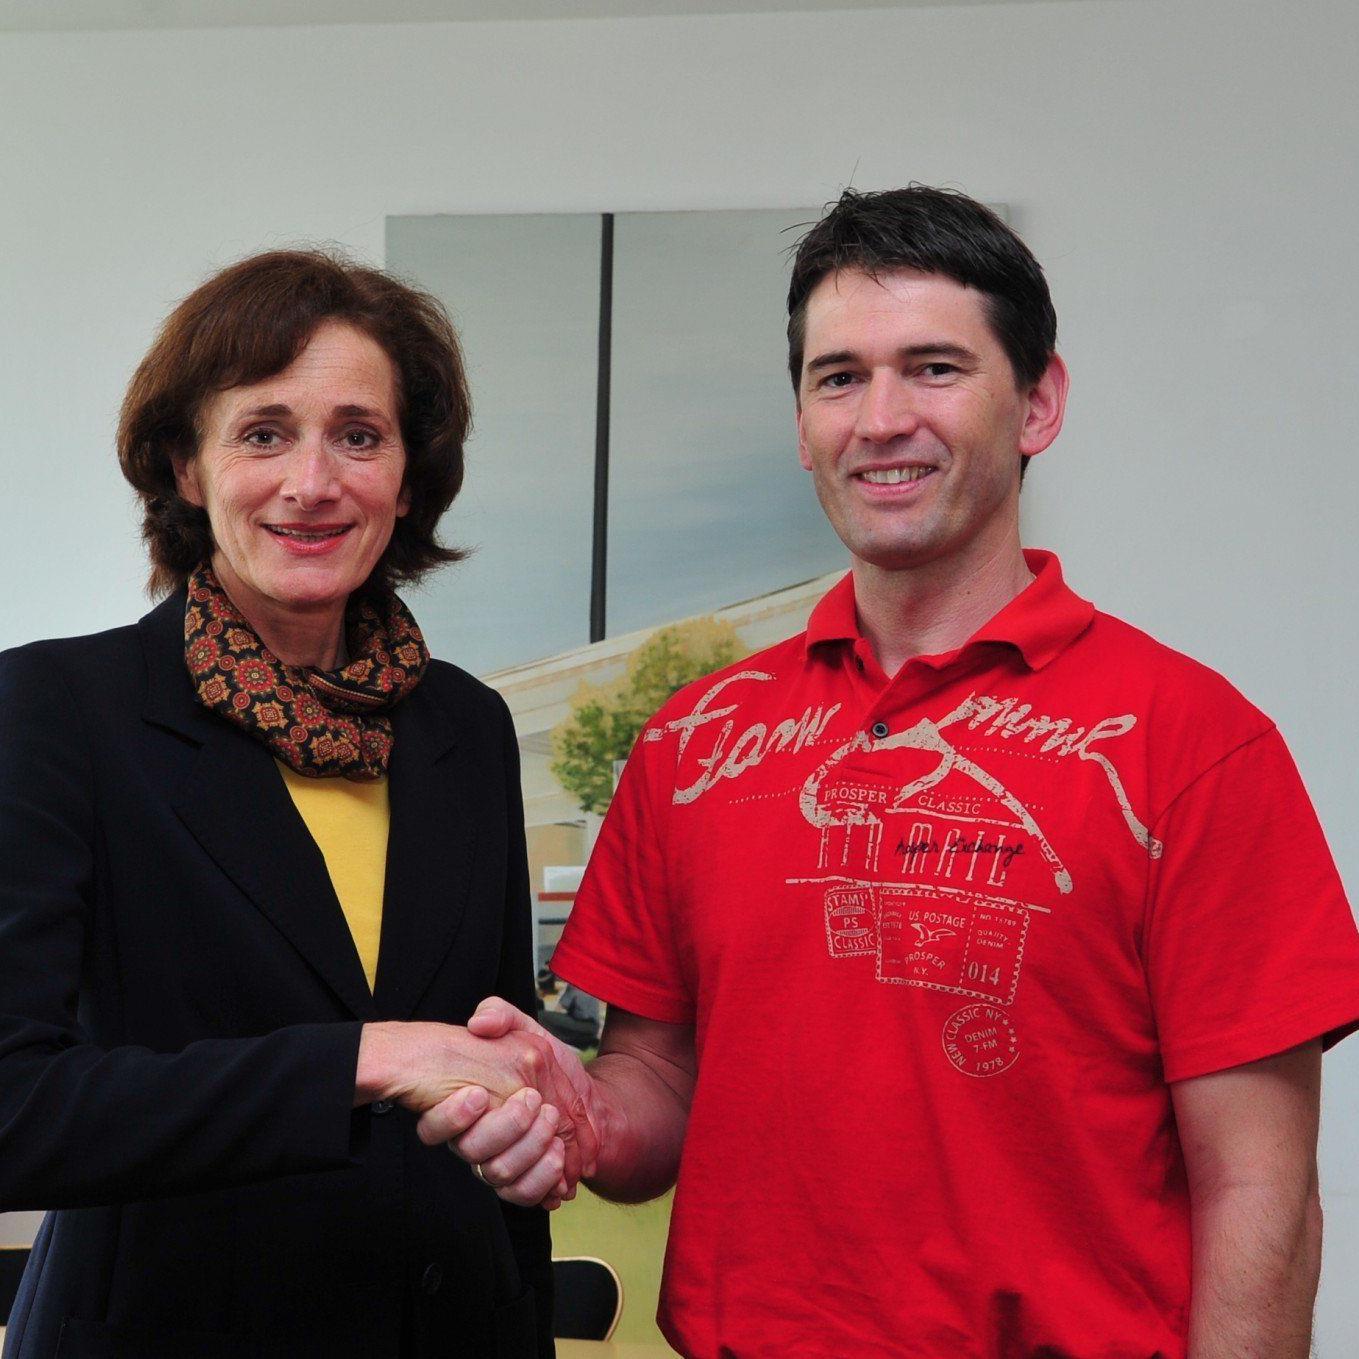 Sportlandesrätin Bernadette Mennel gratulierte dem frisch gebackenen Schießsport-Landestrainer Wolfram Waibel